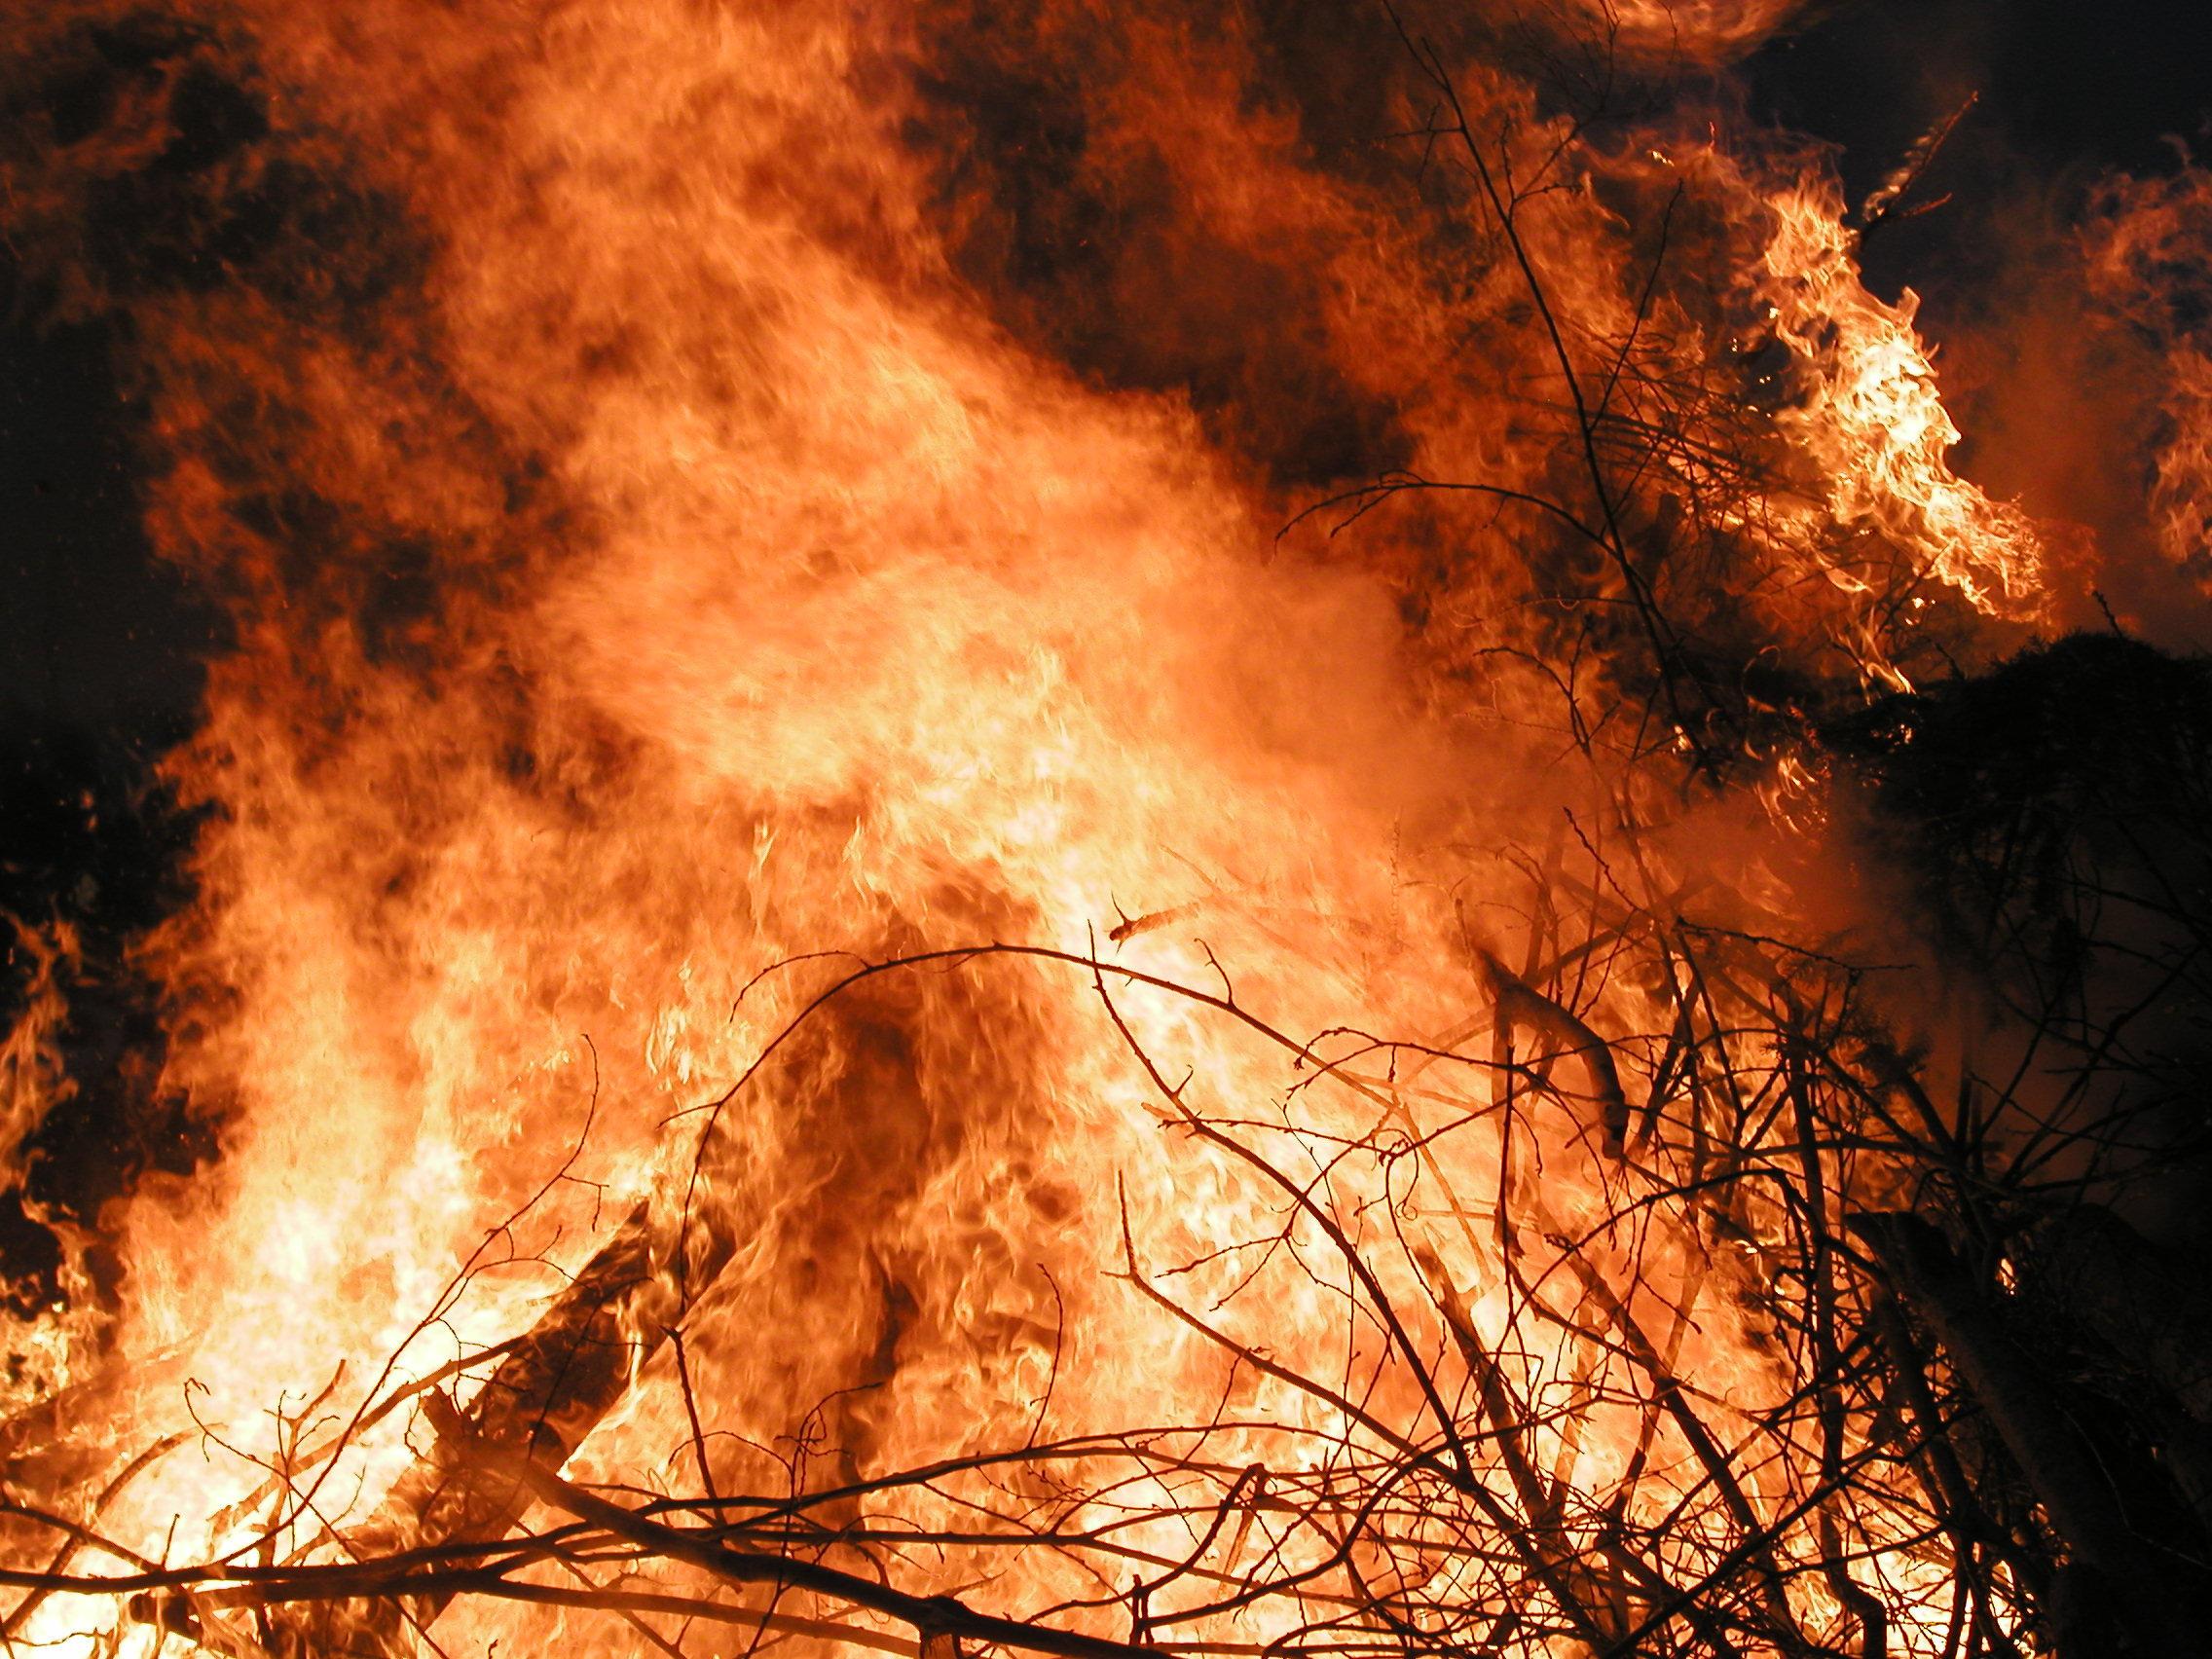 borderline-stock 122 Fire by borderline-stock